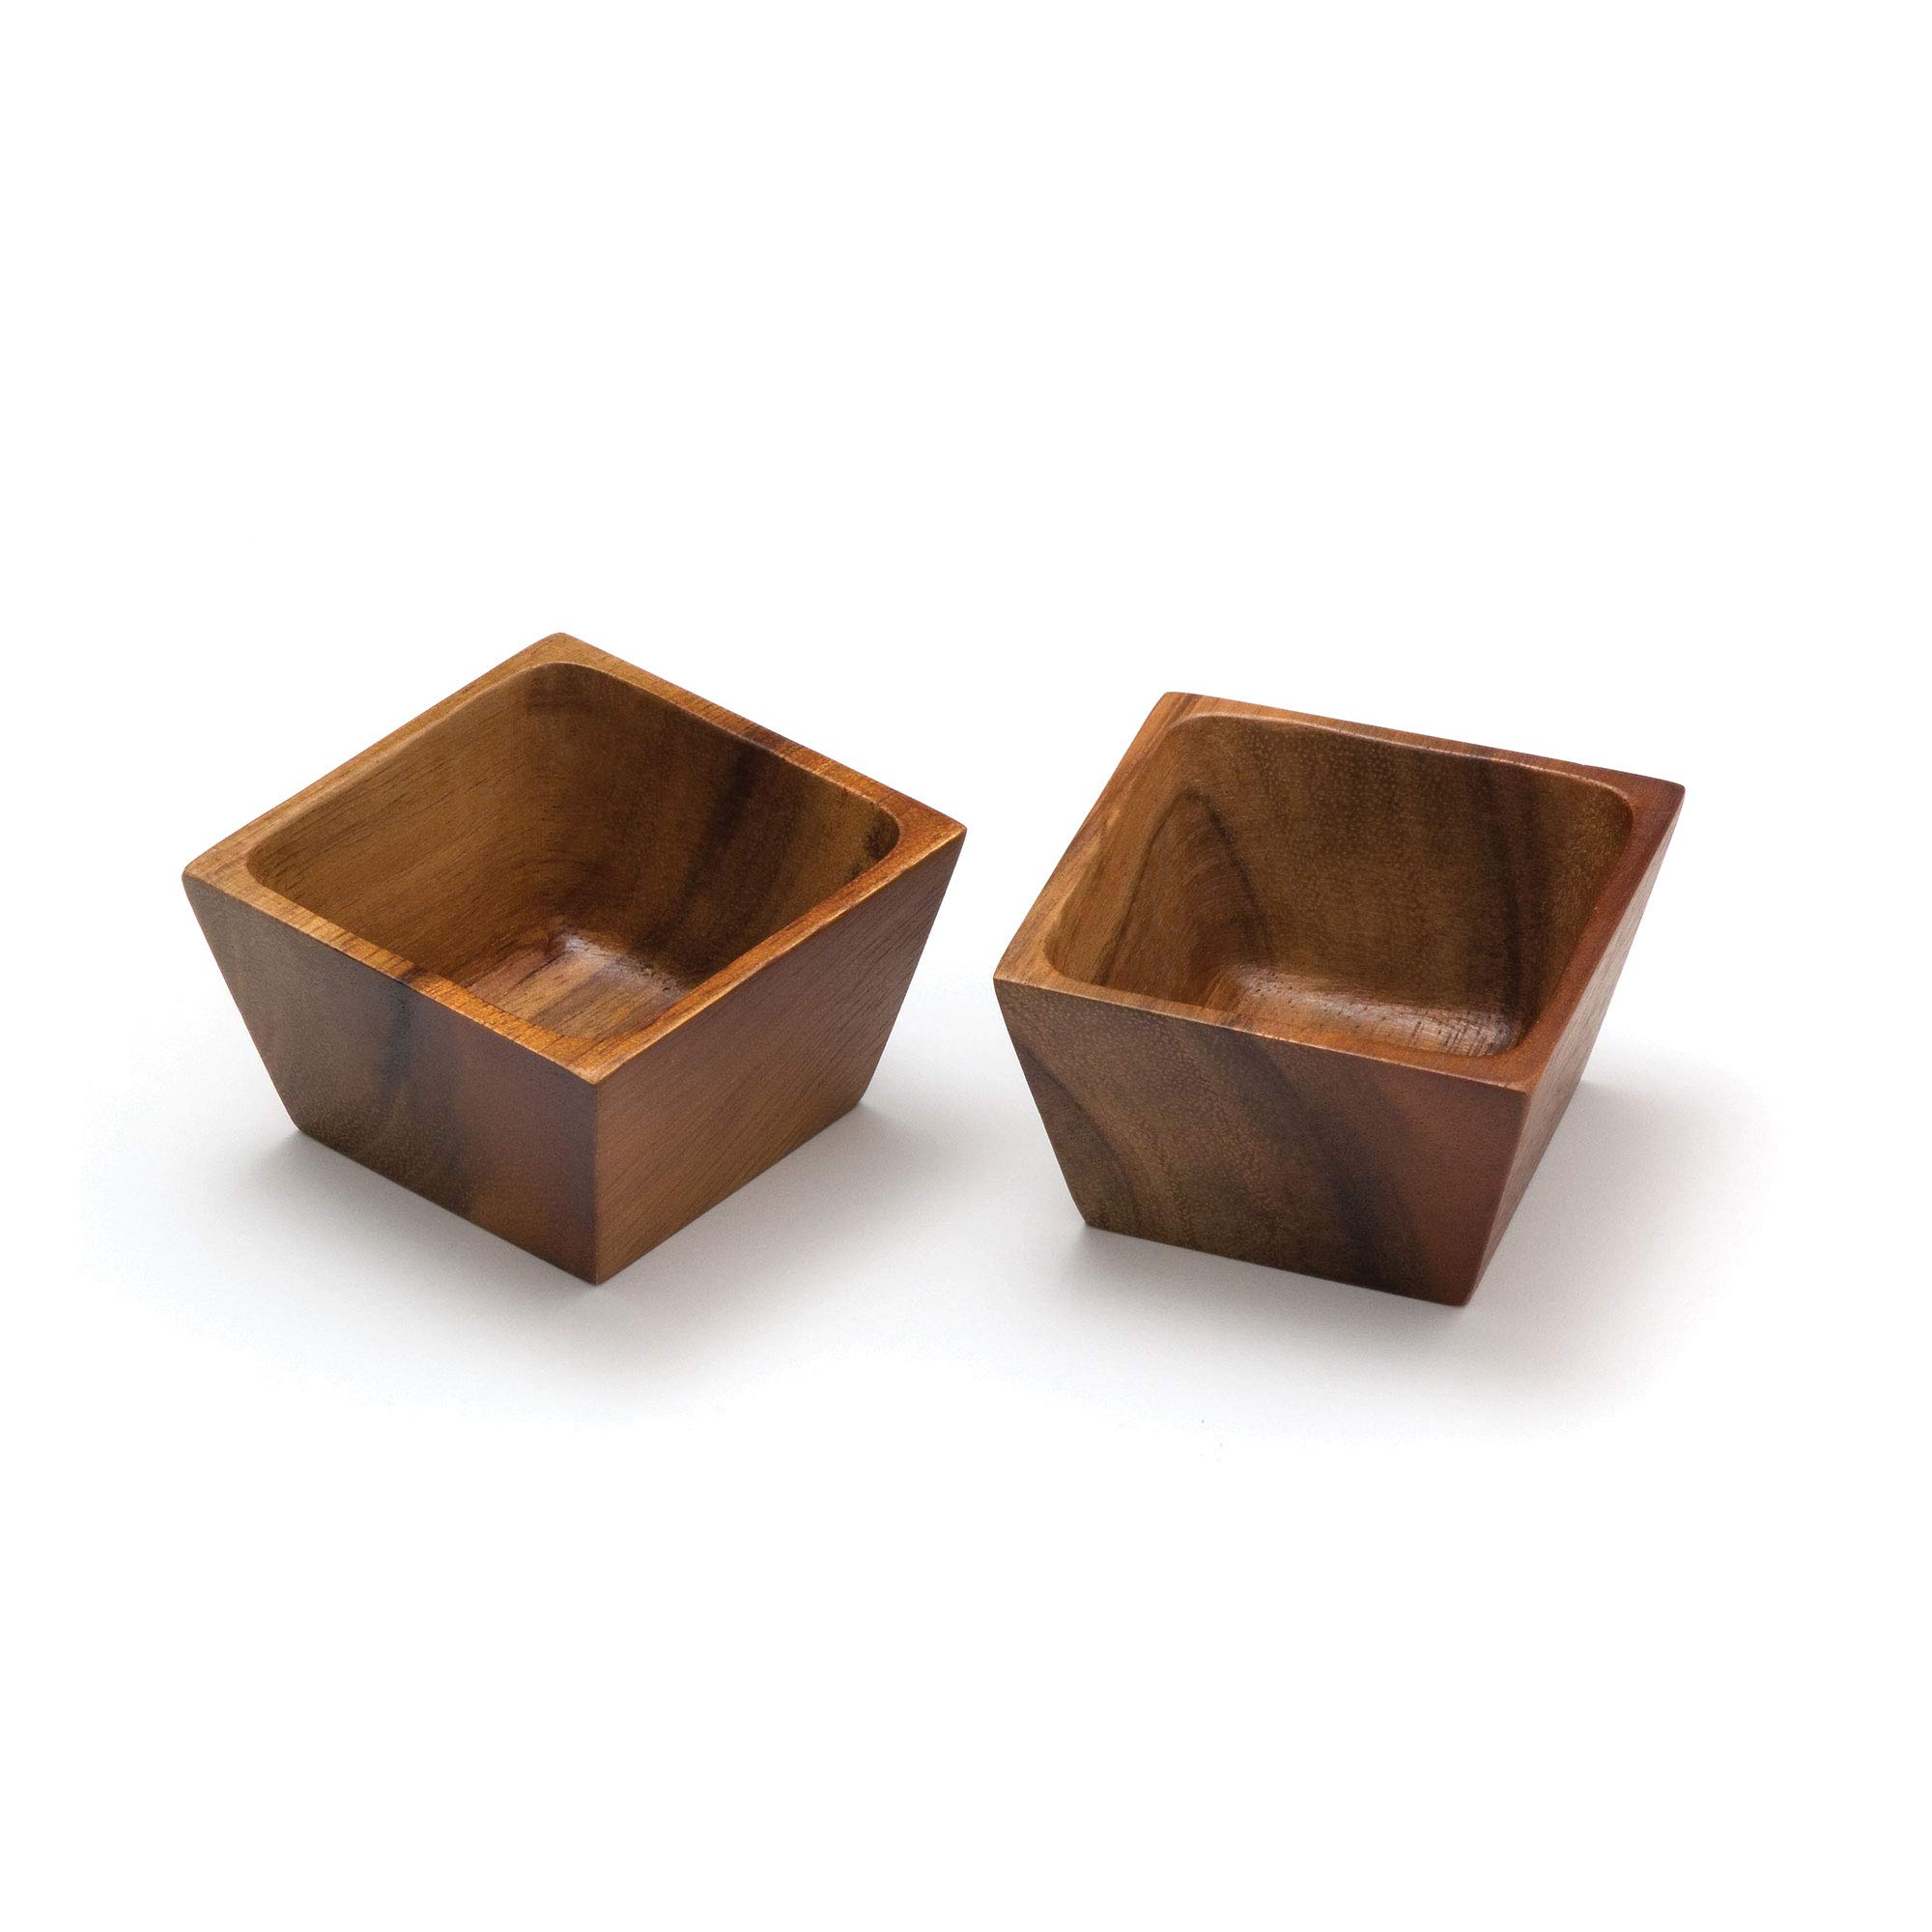 Lipper International 1100-2 Acacia Wood Square Salt Pinch or Serving Bowls, 3'' x 3'' x 2-1/2'', Set of 2 by Lipper International (Image #1)